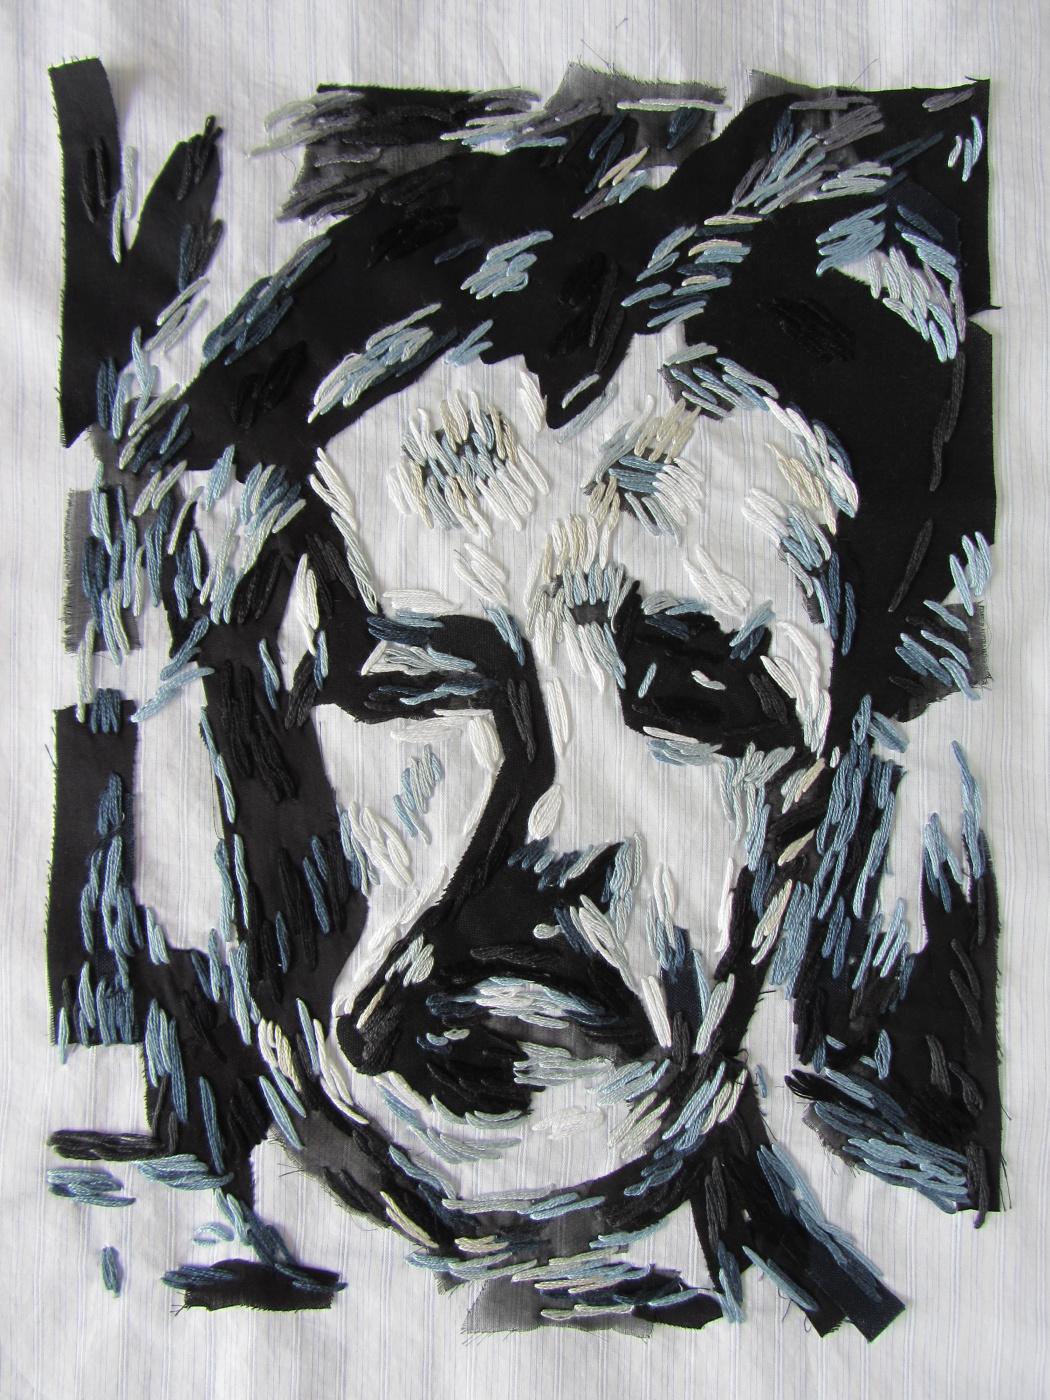 Franz Klein. Self portrait. Copy of the picture